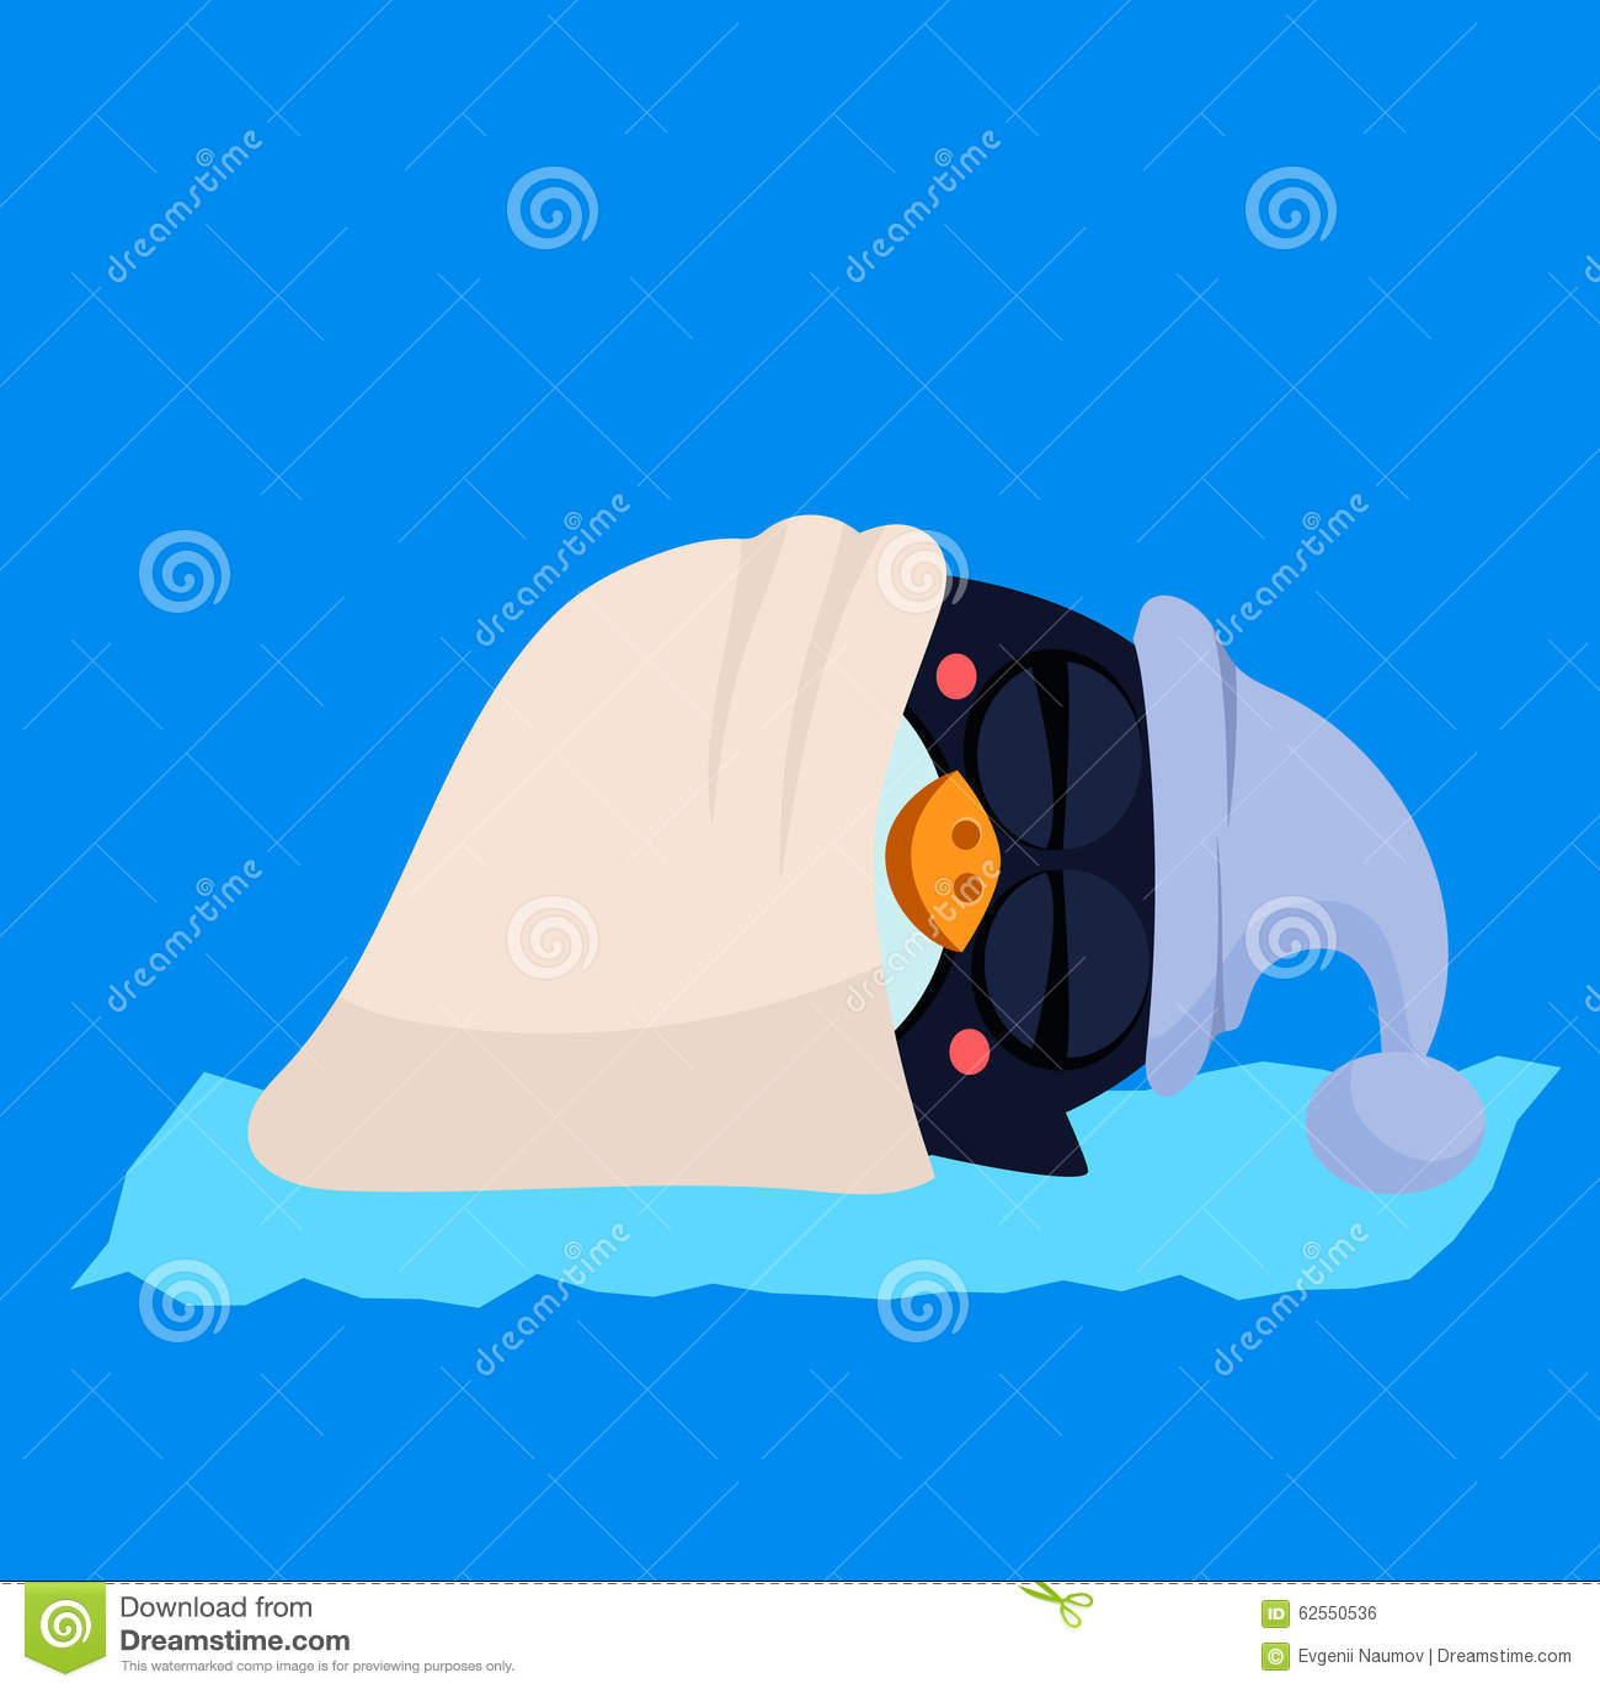 Cute Sleeping Penguin In A Hood Vector Stock Image 62550536